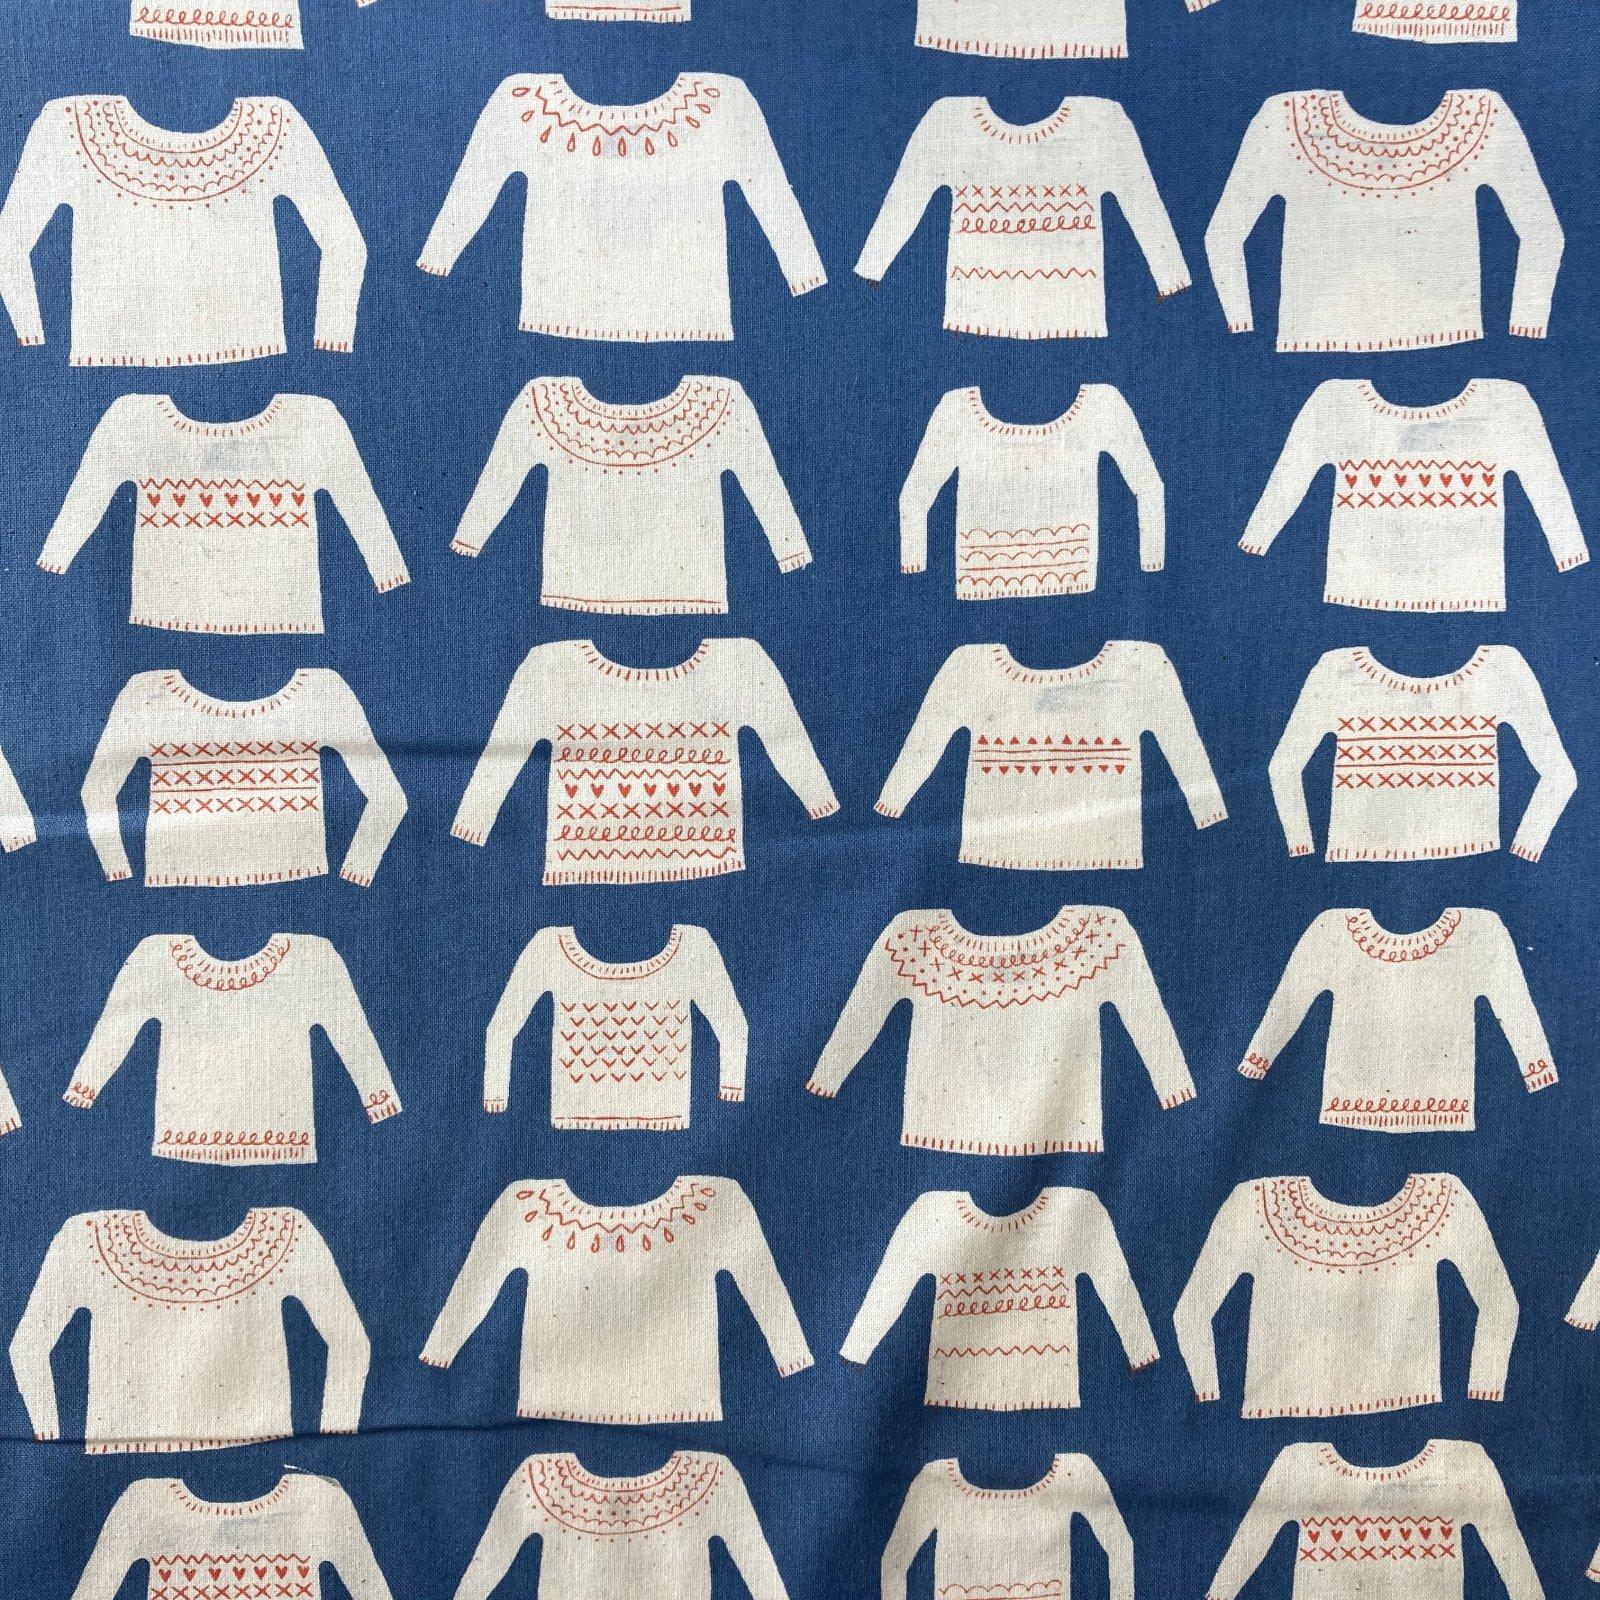 Cozy, My Favorite Sweater, Blue Unbleached Cotton